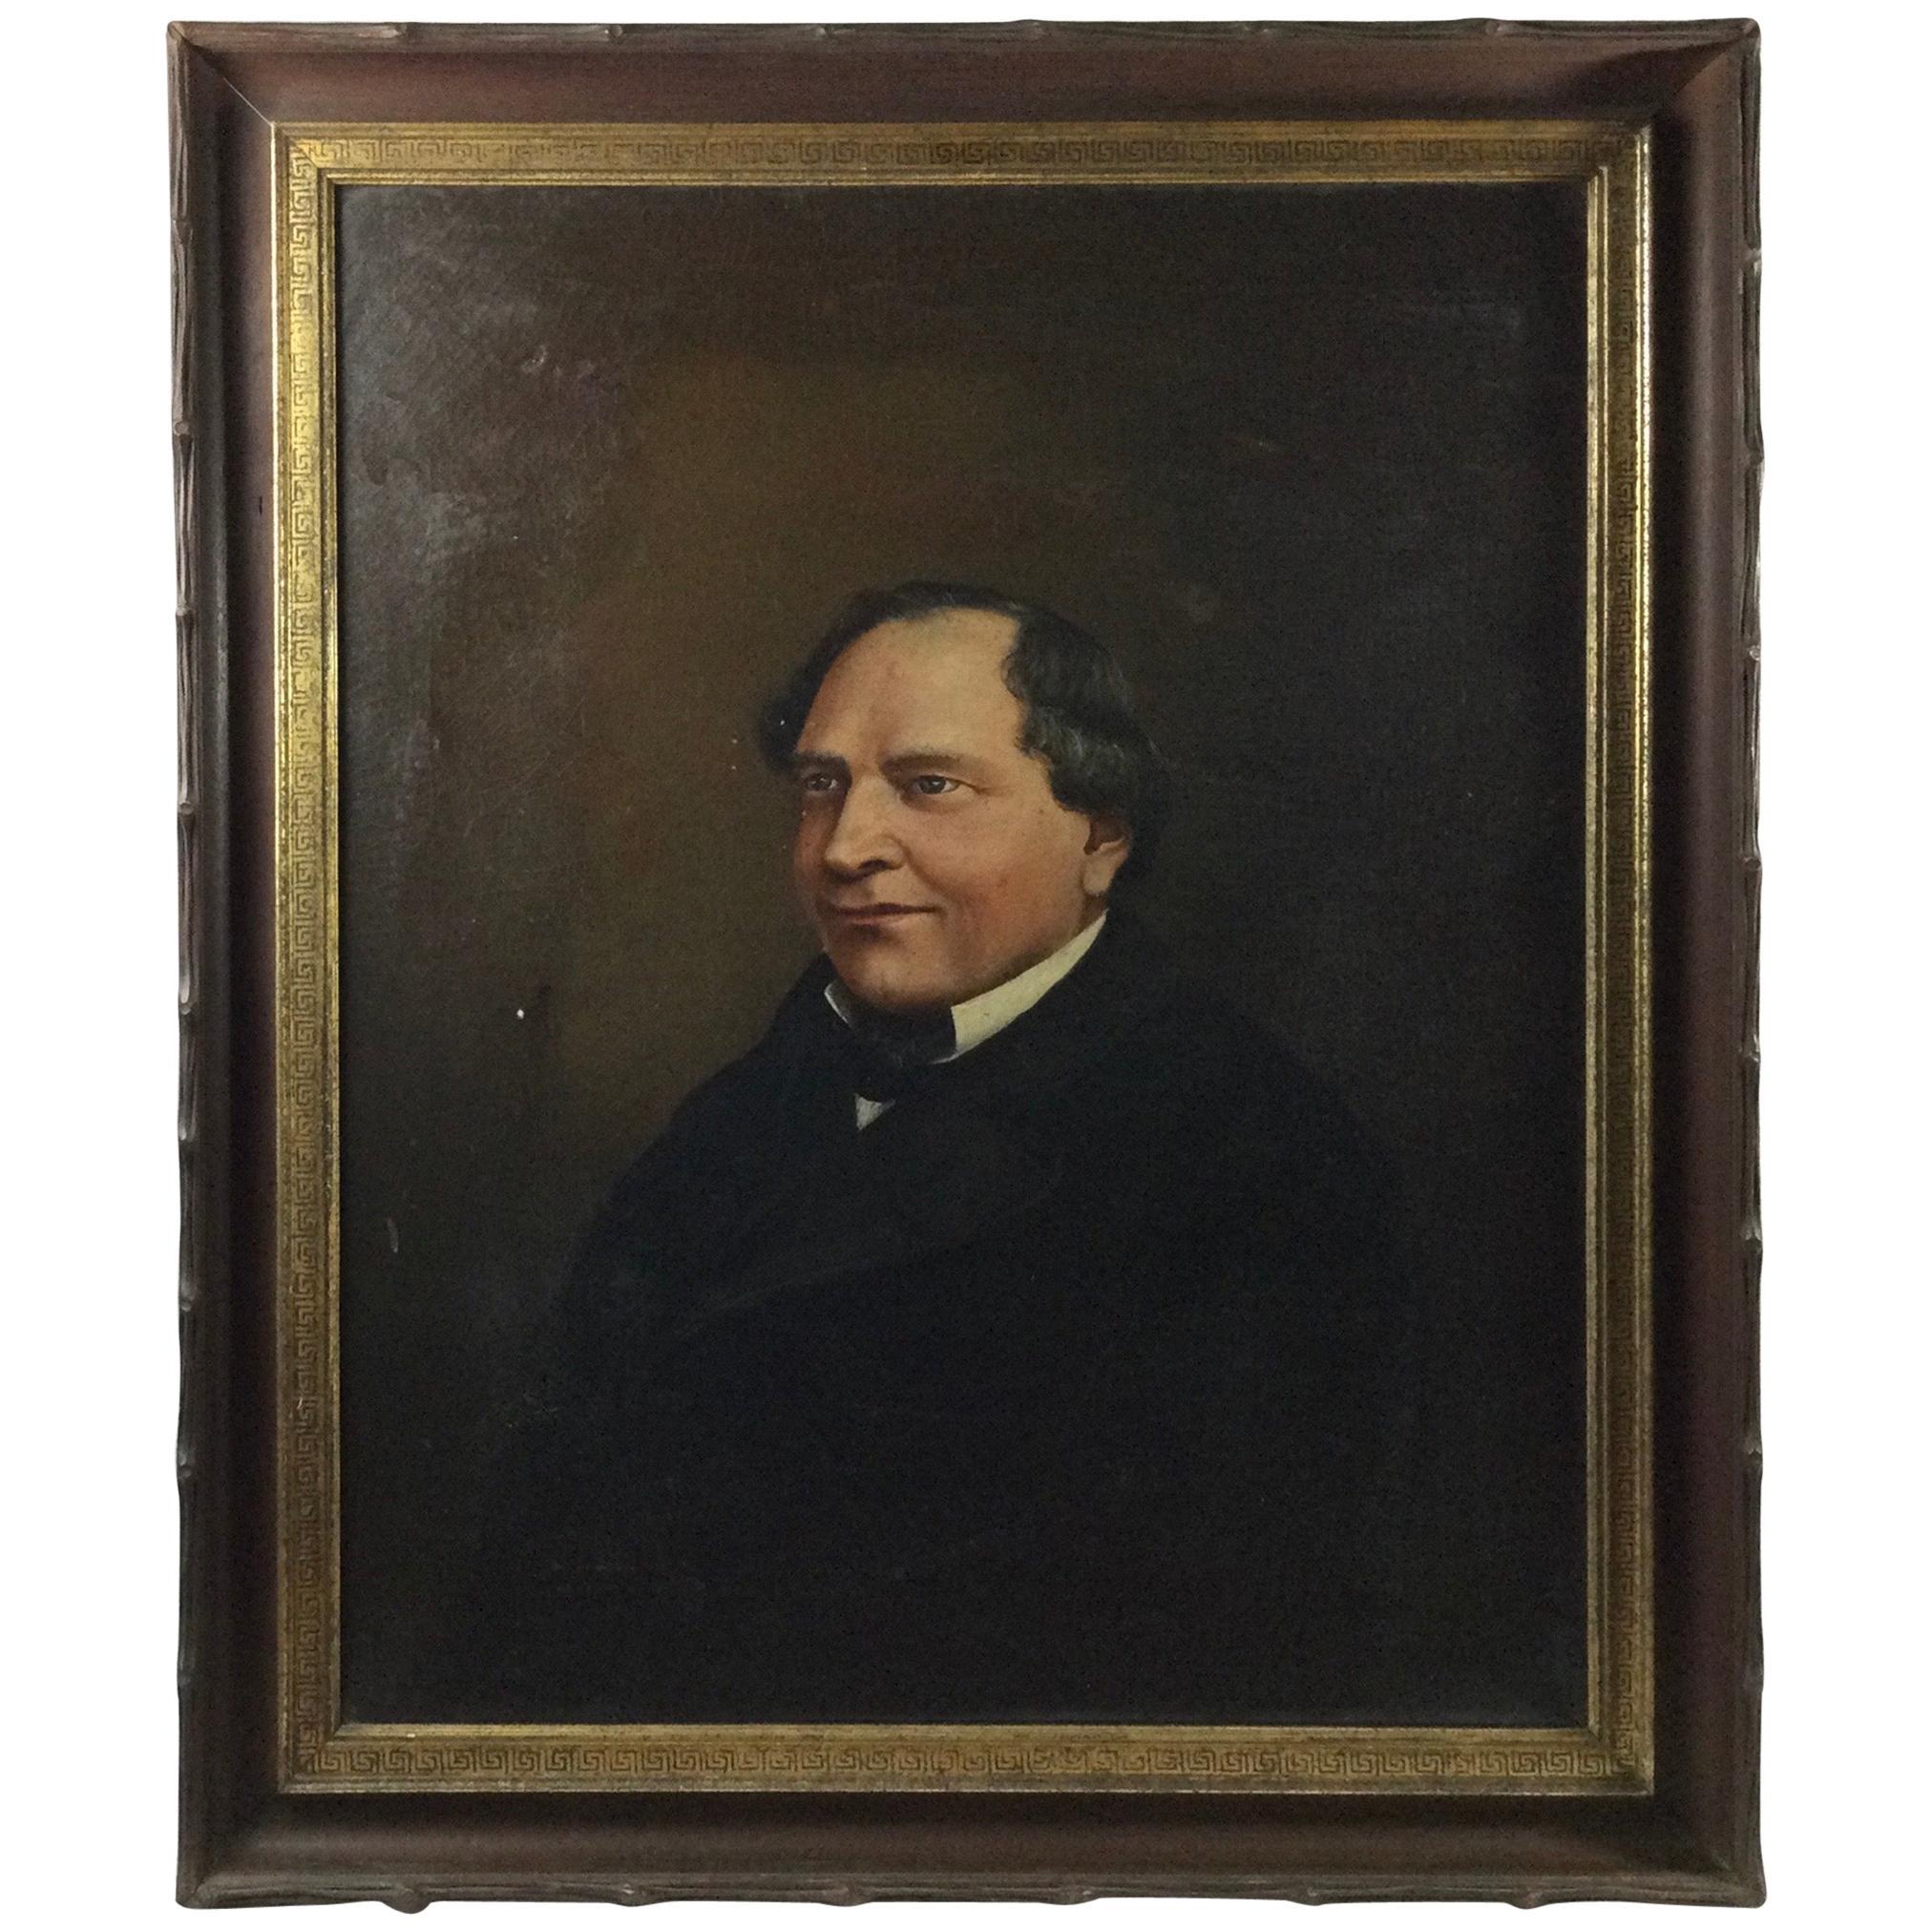 American Portrait of a Gentleman, circa 1800s